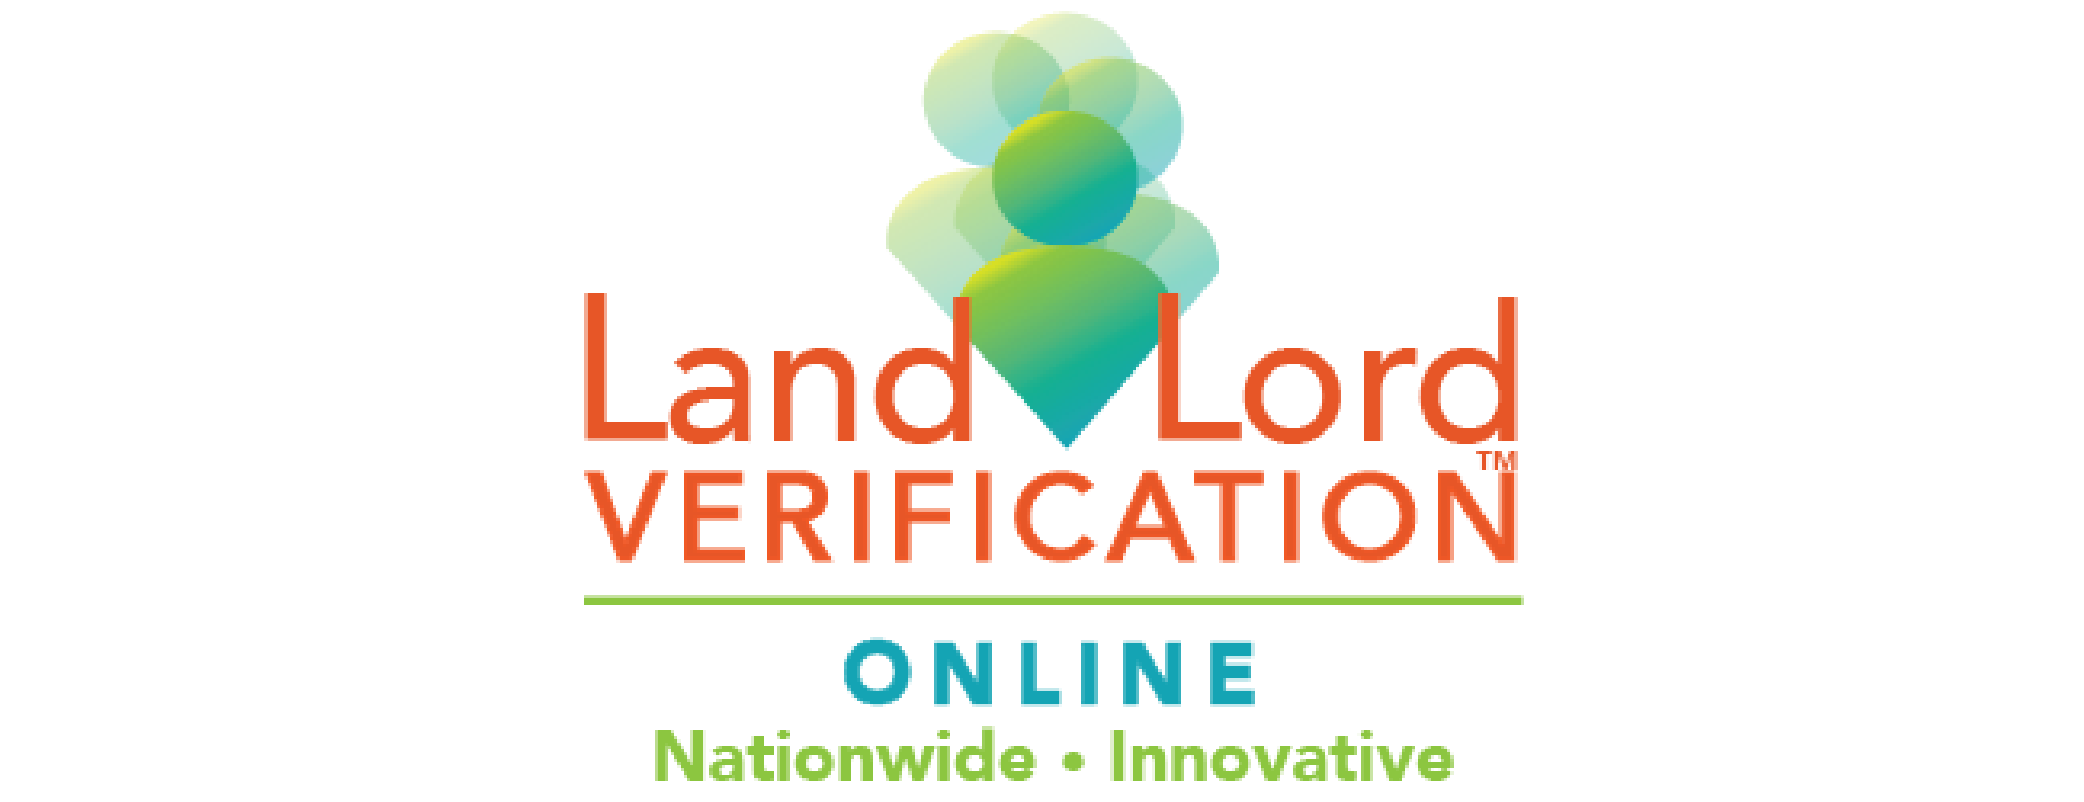 LandLord Verification